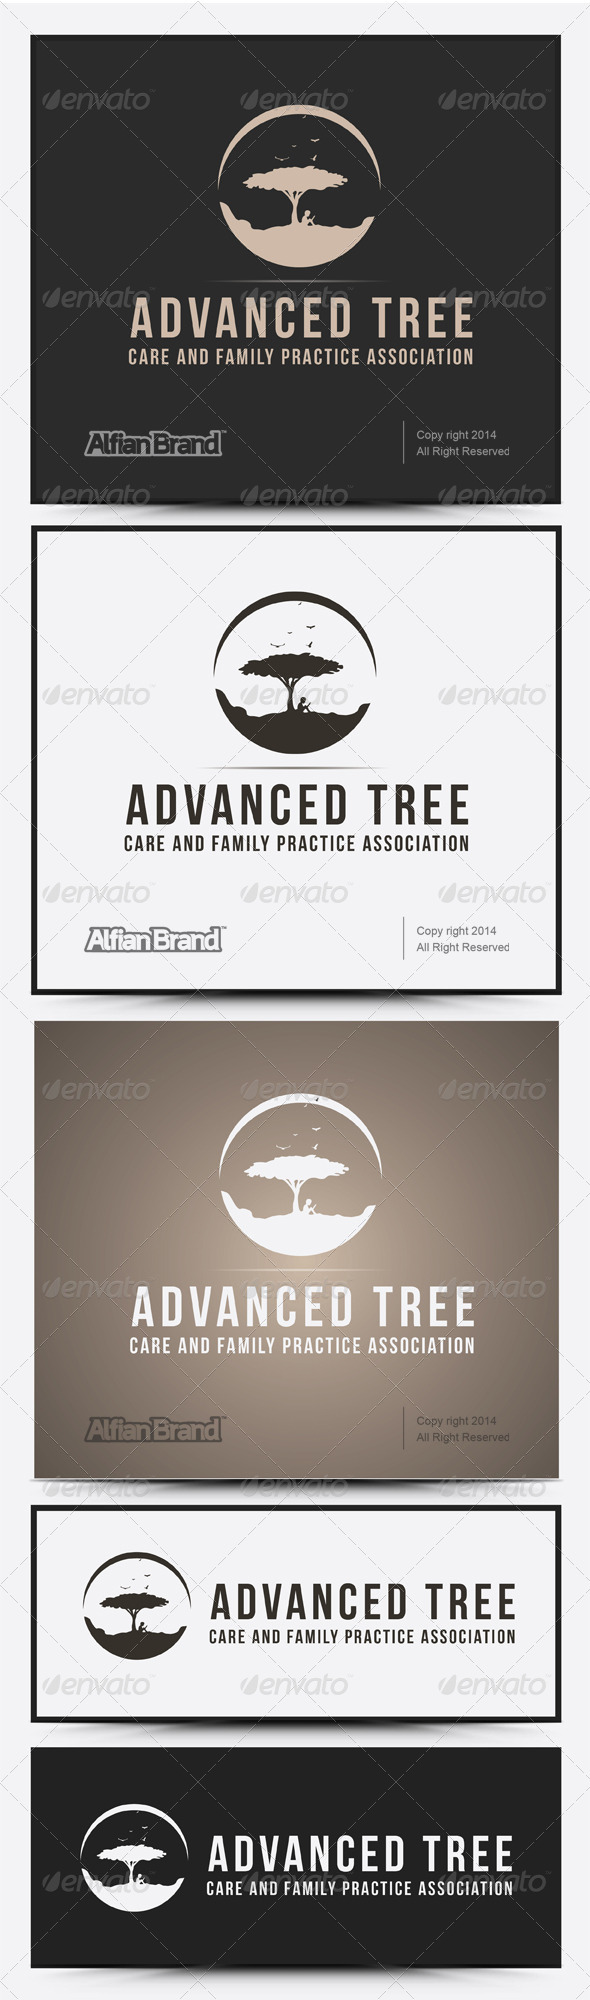 GraphicRiver Advanced Tree Logo 7938332